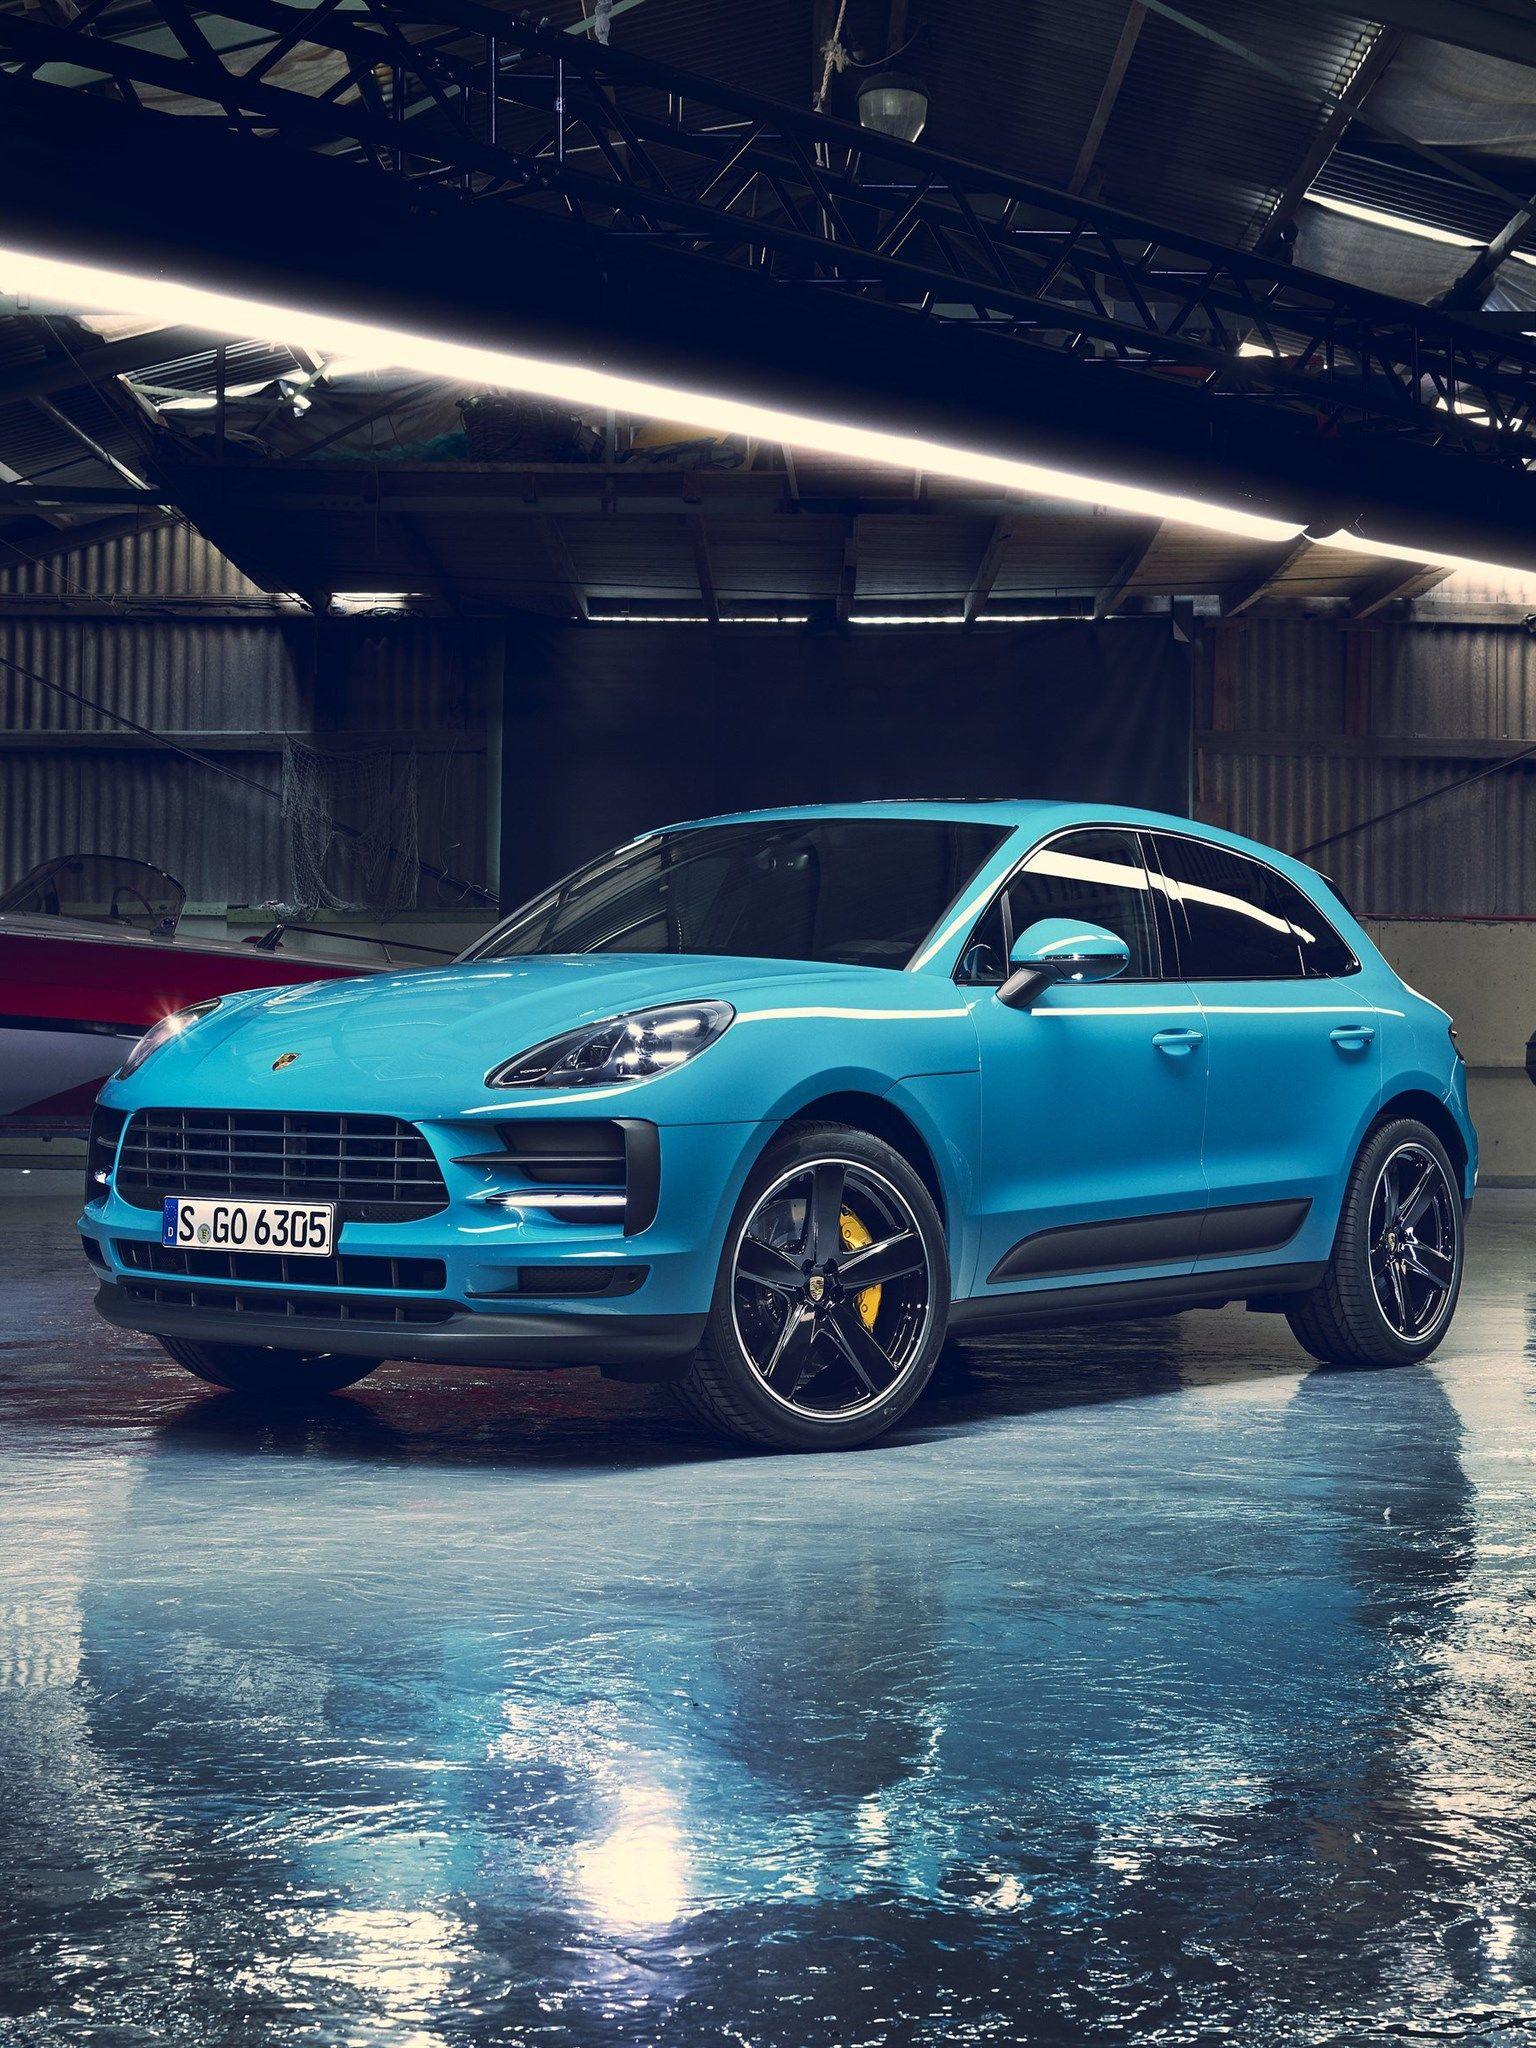 Porsche Macan, 2019, 4k, front view, exterior, garage, new